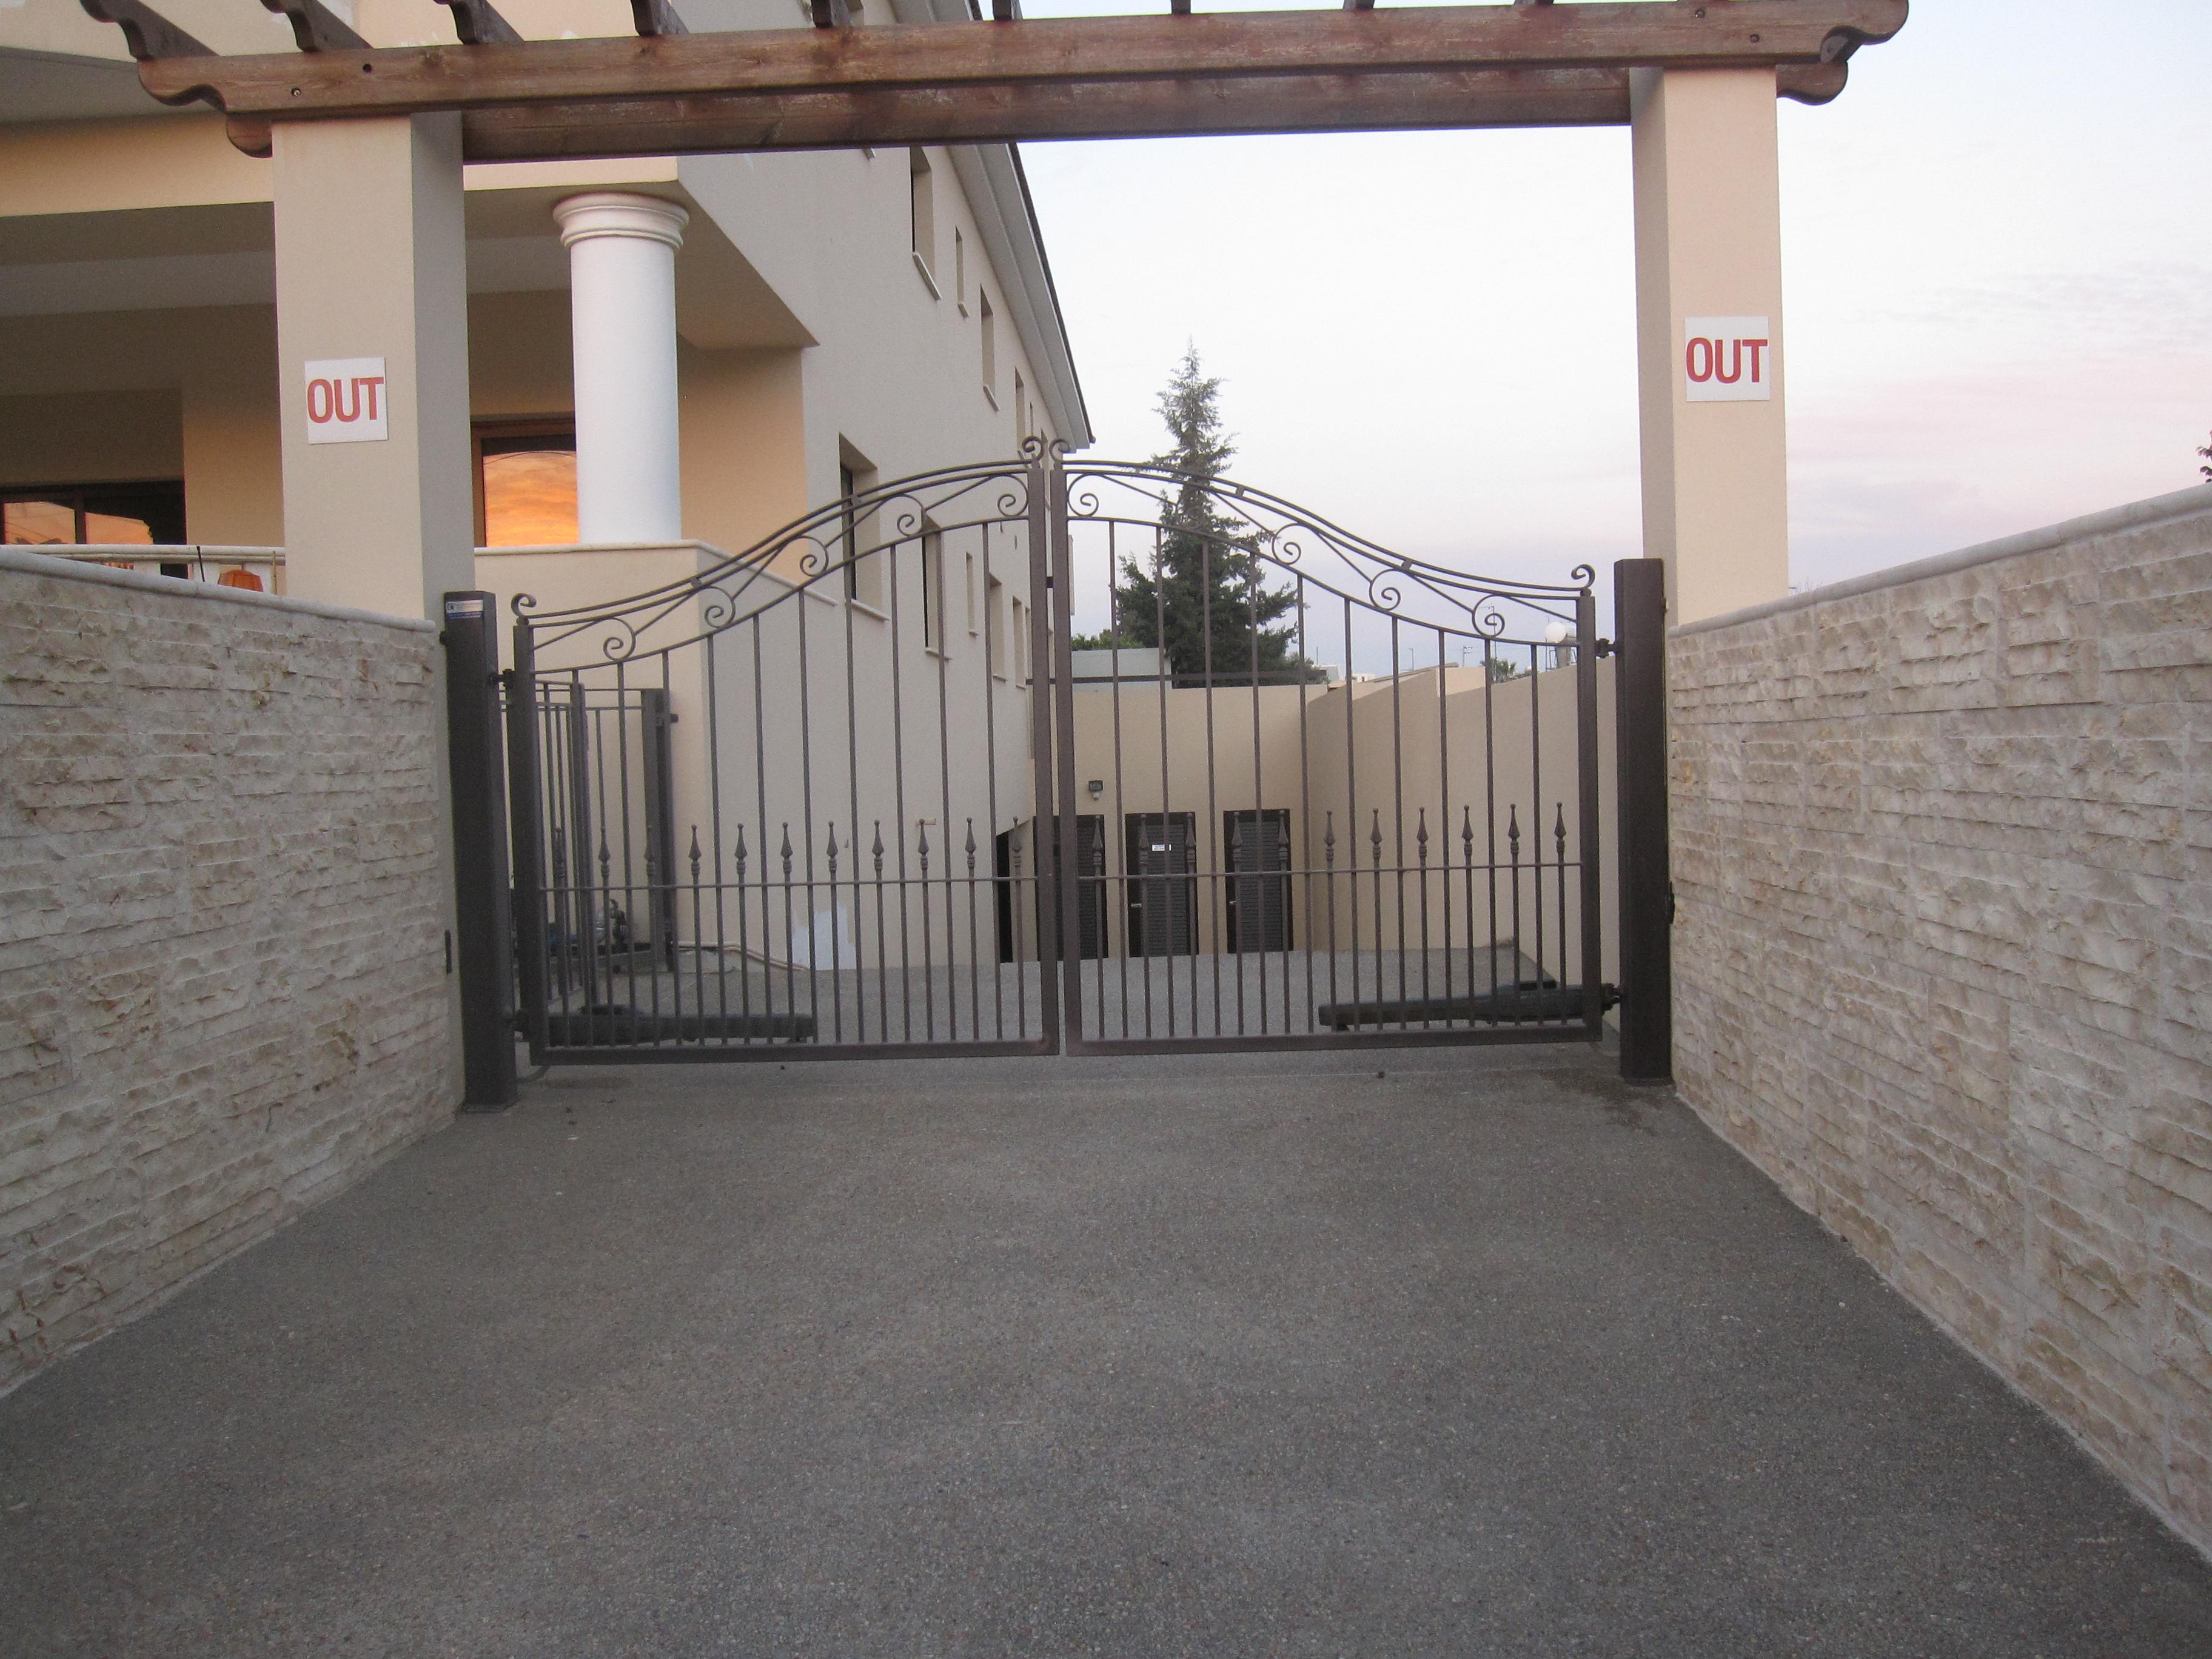 PRINCE swing gate operator